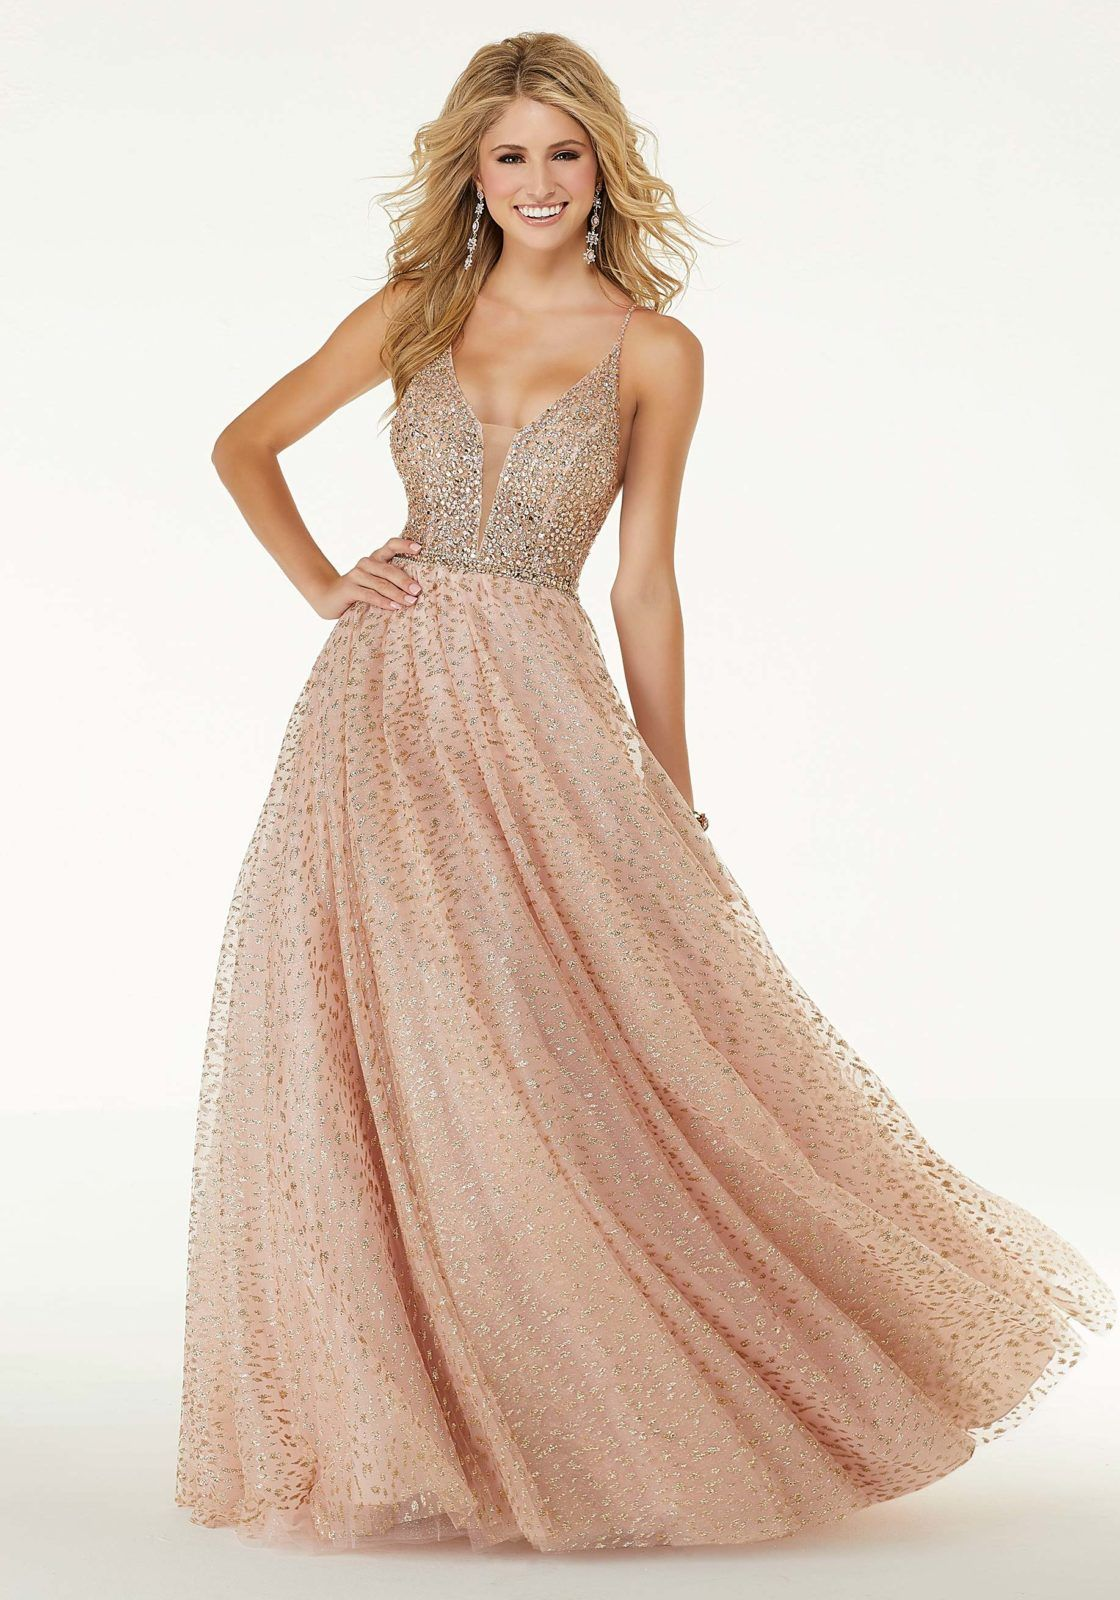 Glitter Beaded Ballgown Prom Dress Stunning Prom Dresses Prom Dresses Ball Gown Prom Dress Stores [ 1600 x 1120 Pixel ]